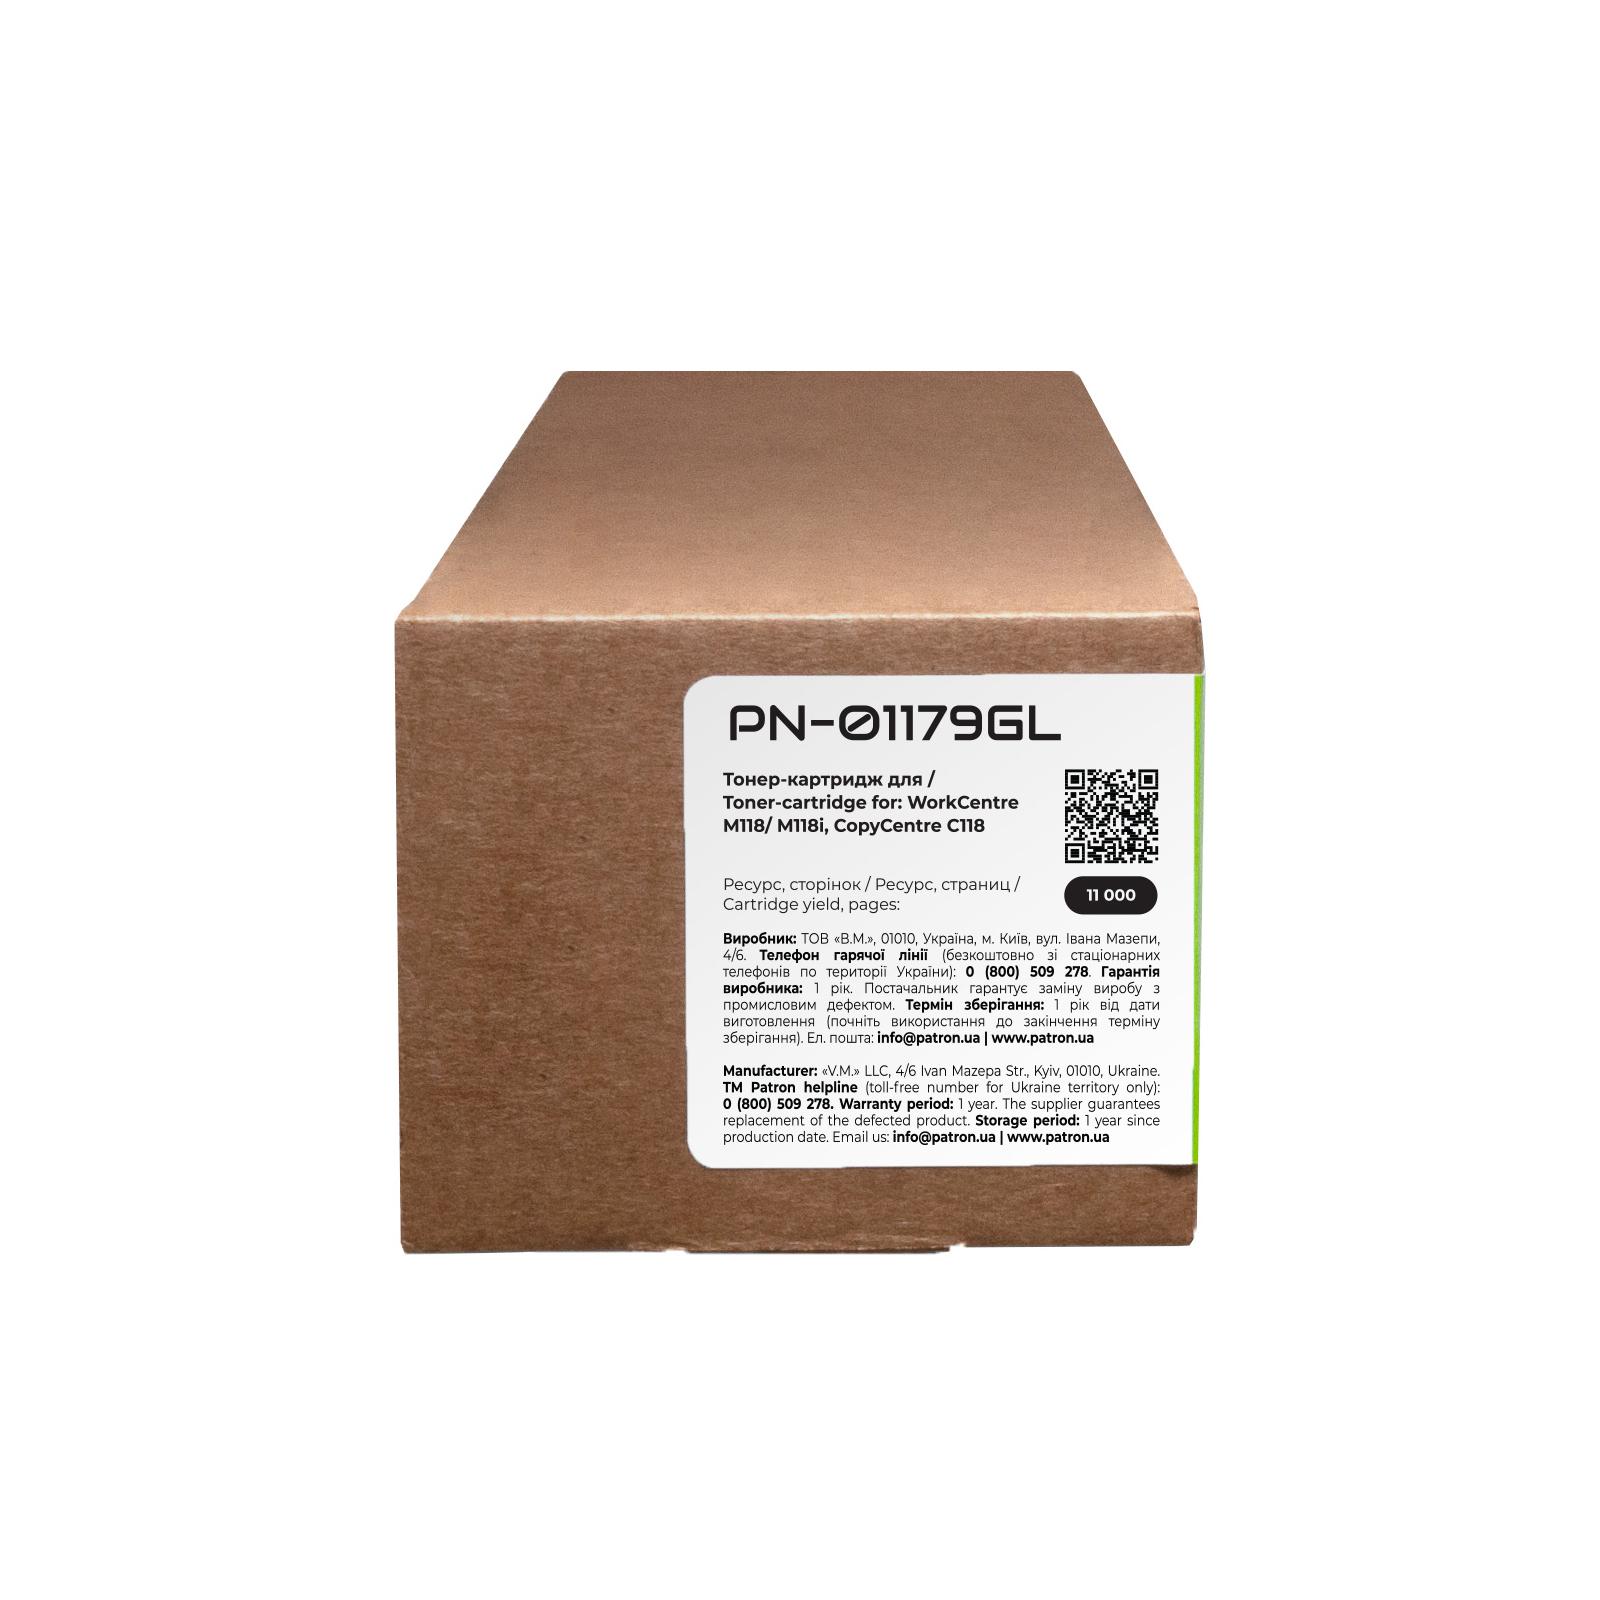 Тонер-картридж Patron XEROX WC M118/006R01179 GREEN Label (PN-01179GL) изображение 3